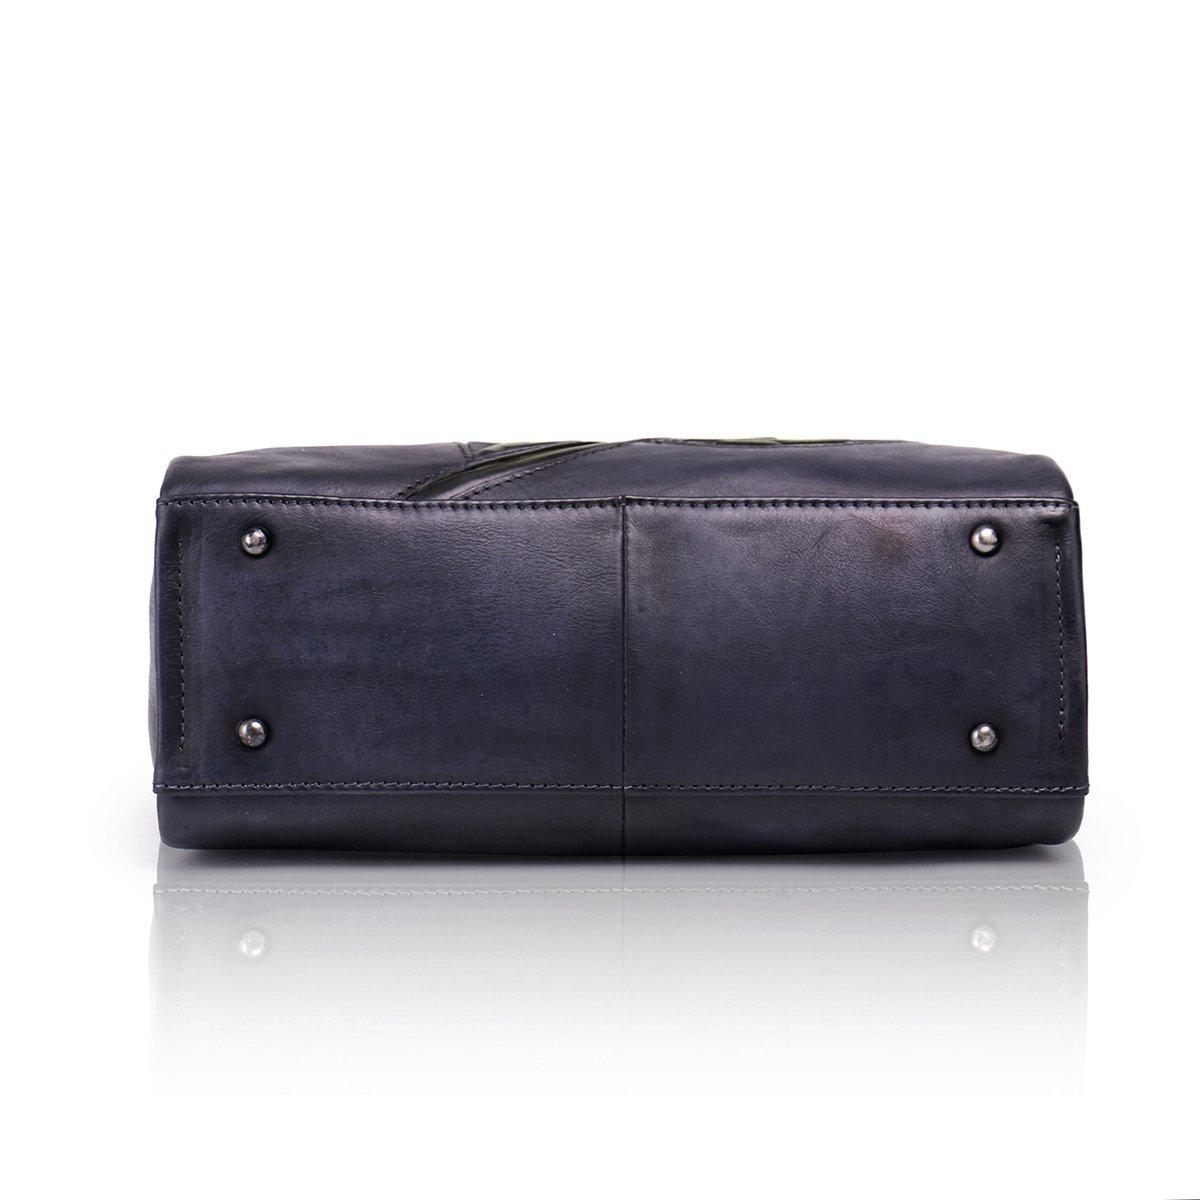 Aphison Designer Soft Leather Totes Handbags for Women, Ladies Satchels Shoulder Bags (BLACK) by APHISON (Image #4)